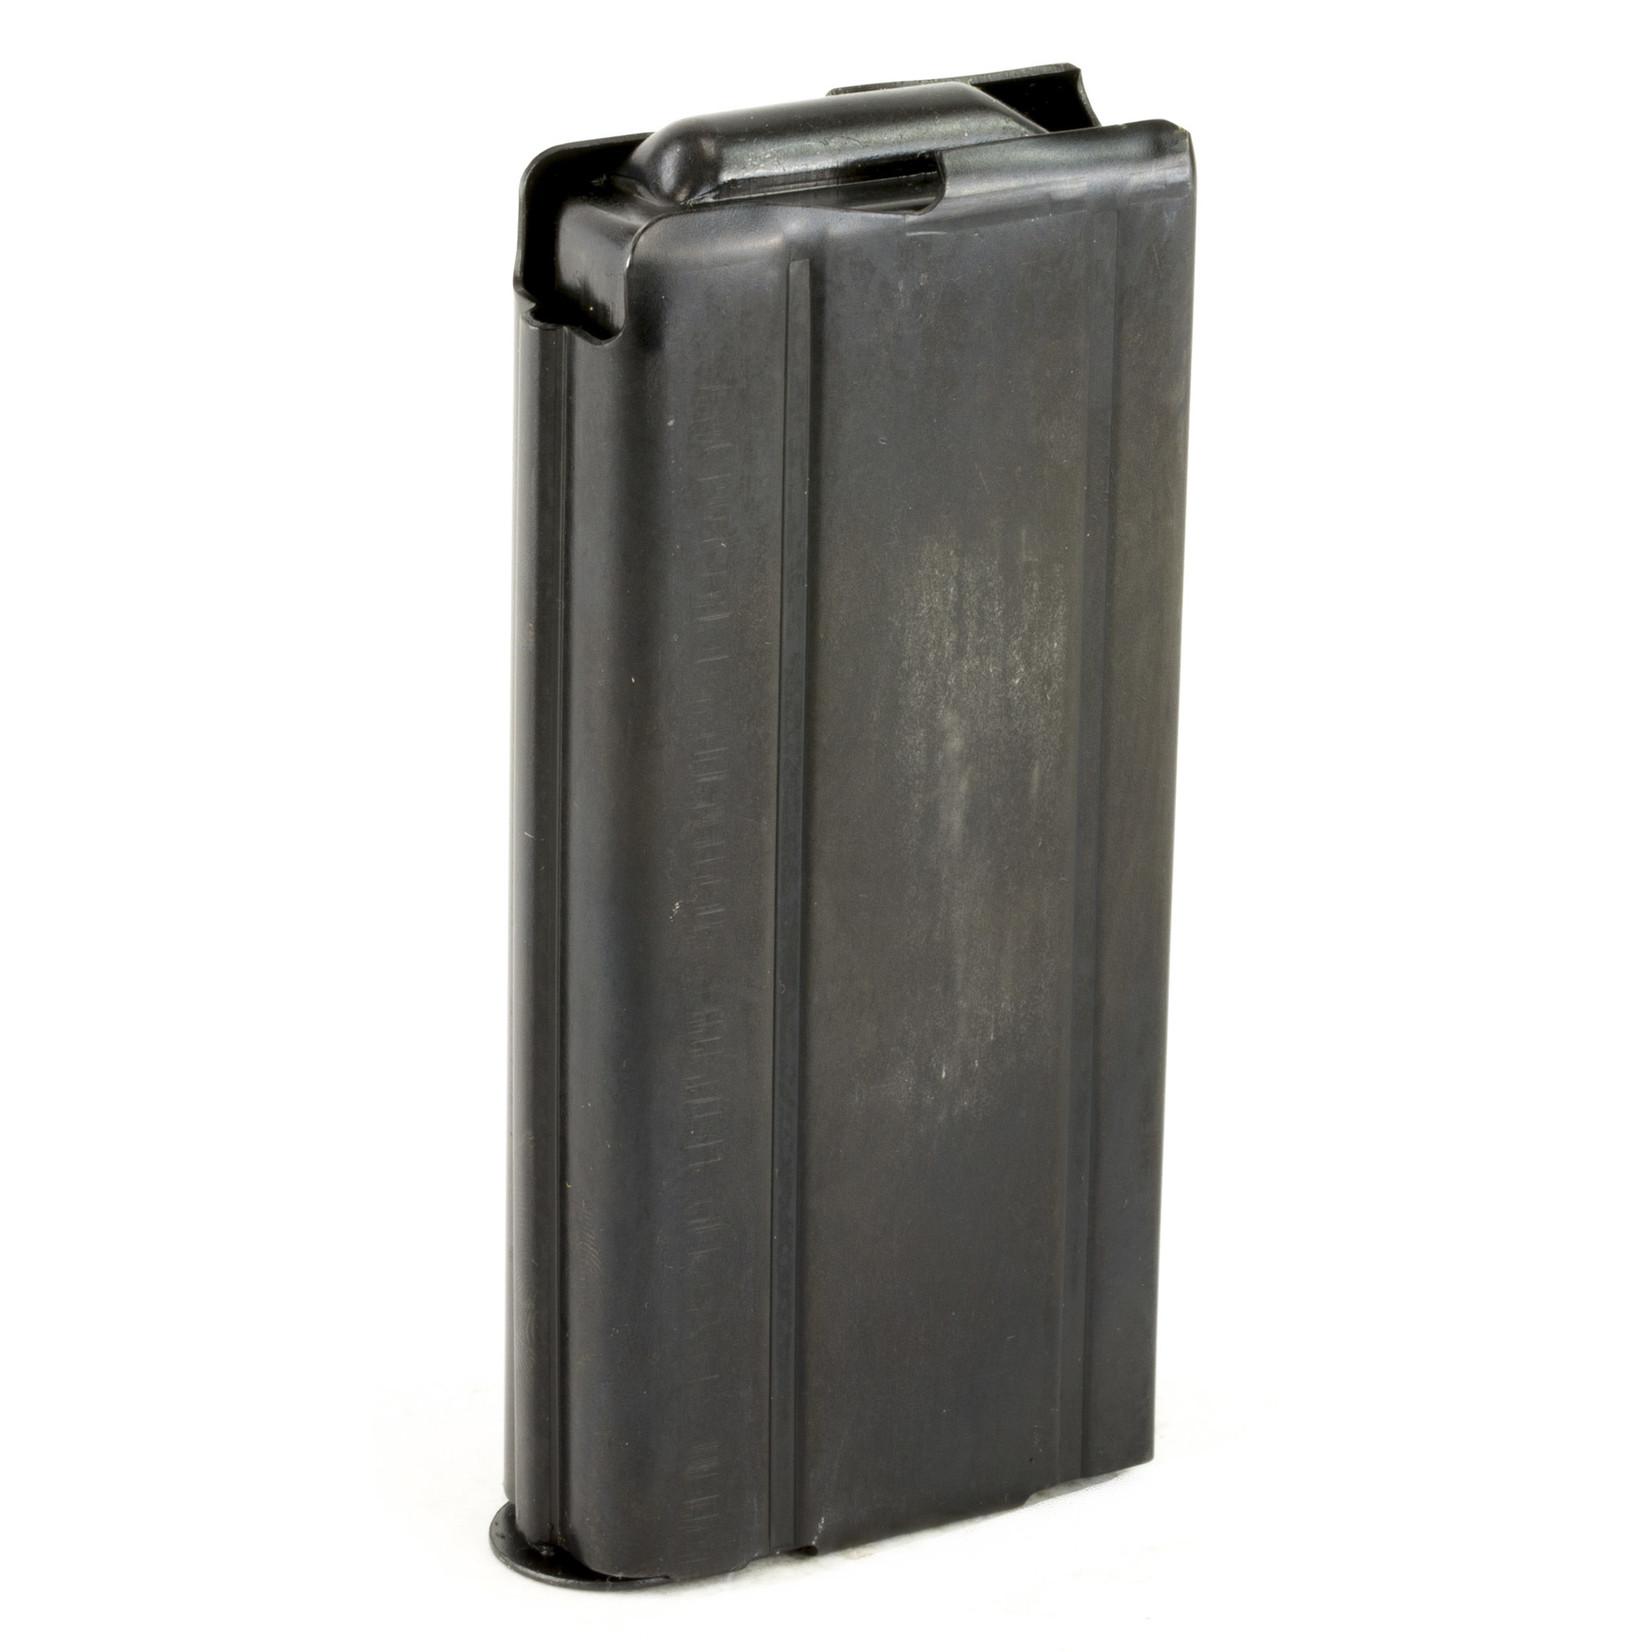 Pro Mag ProMag, Magazine, 30 Carbine, 15Rd, Fits M1 Carbine, Blue